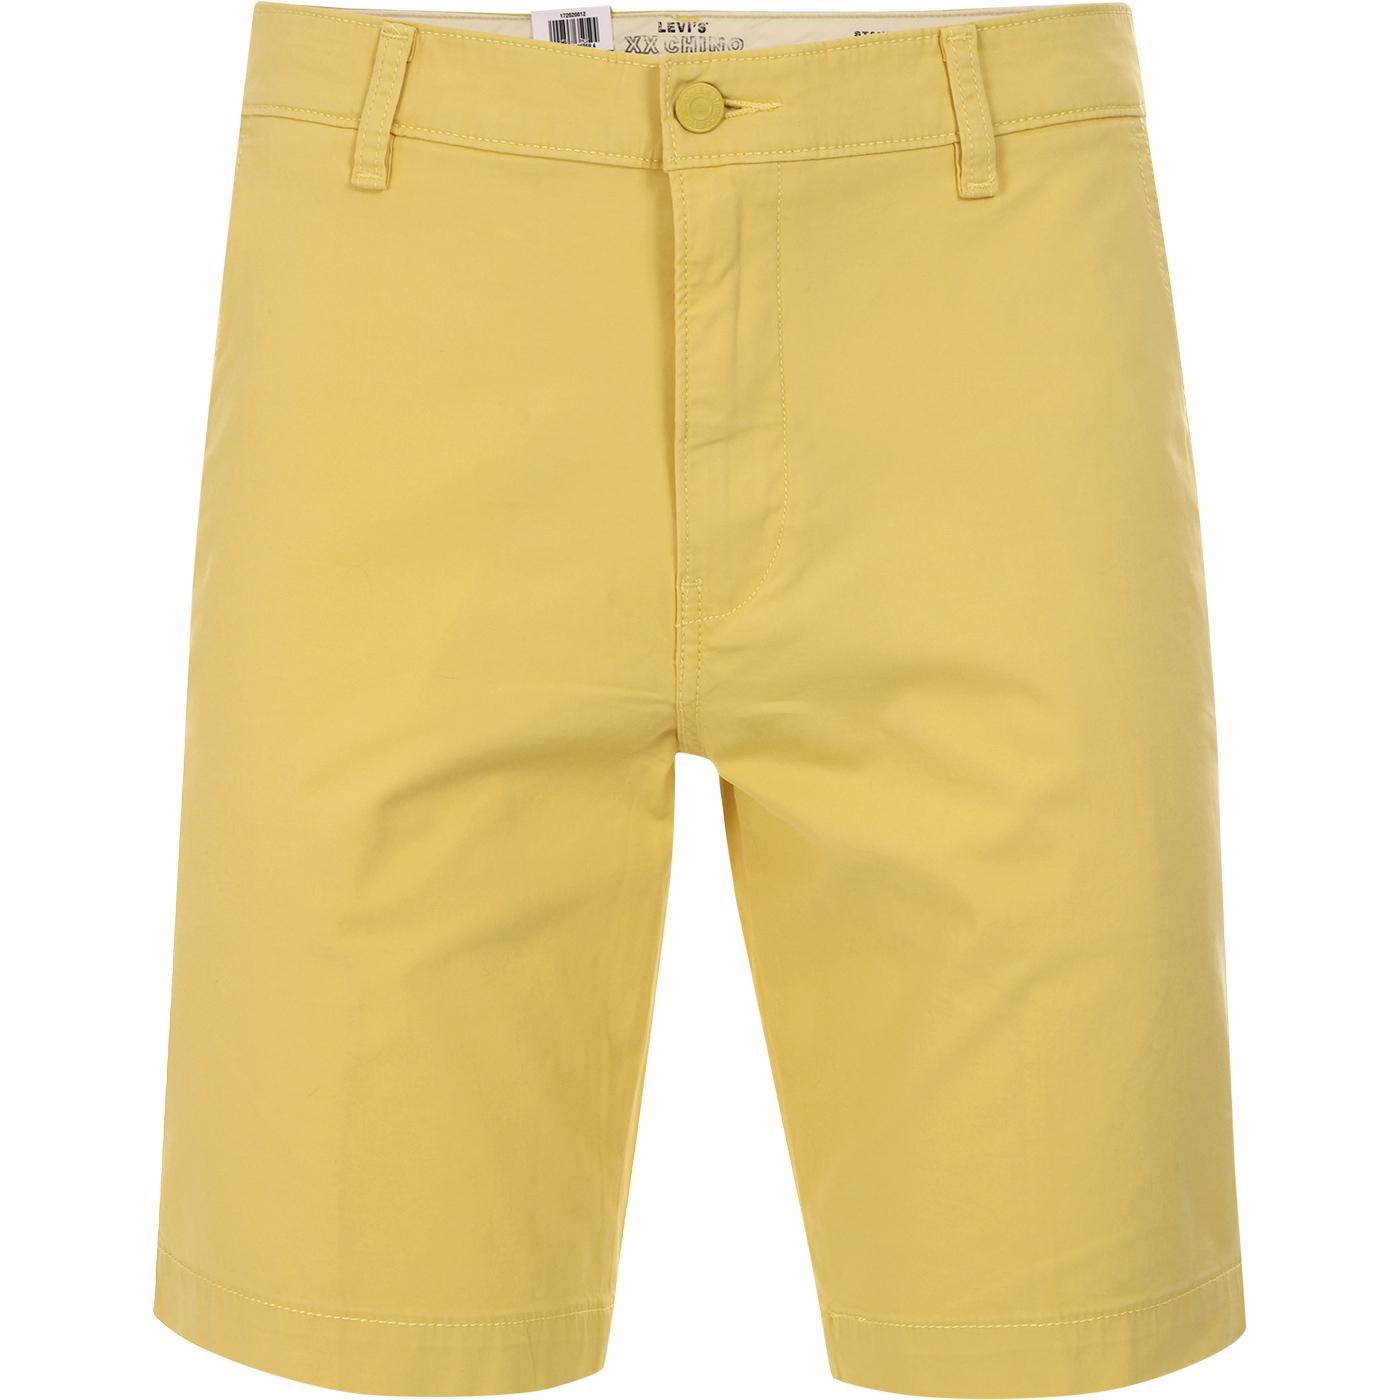 LEVI'S Retro Regular Taper XX Chino Shorts (DC)